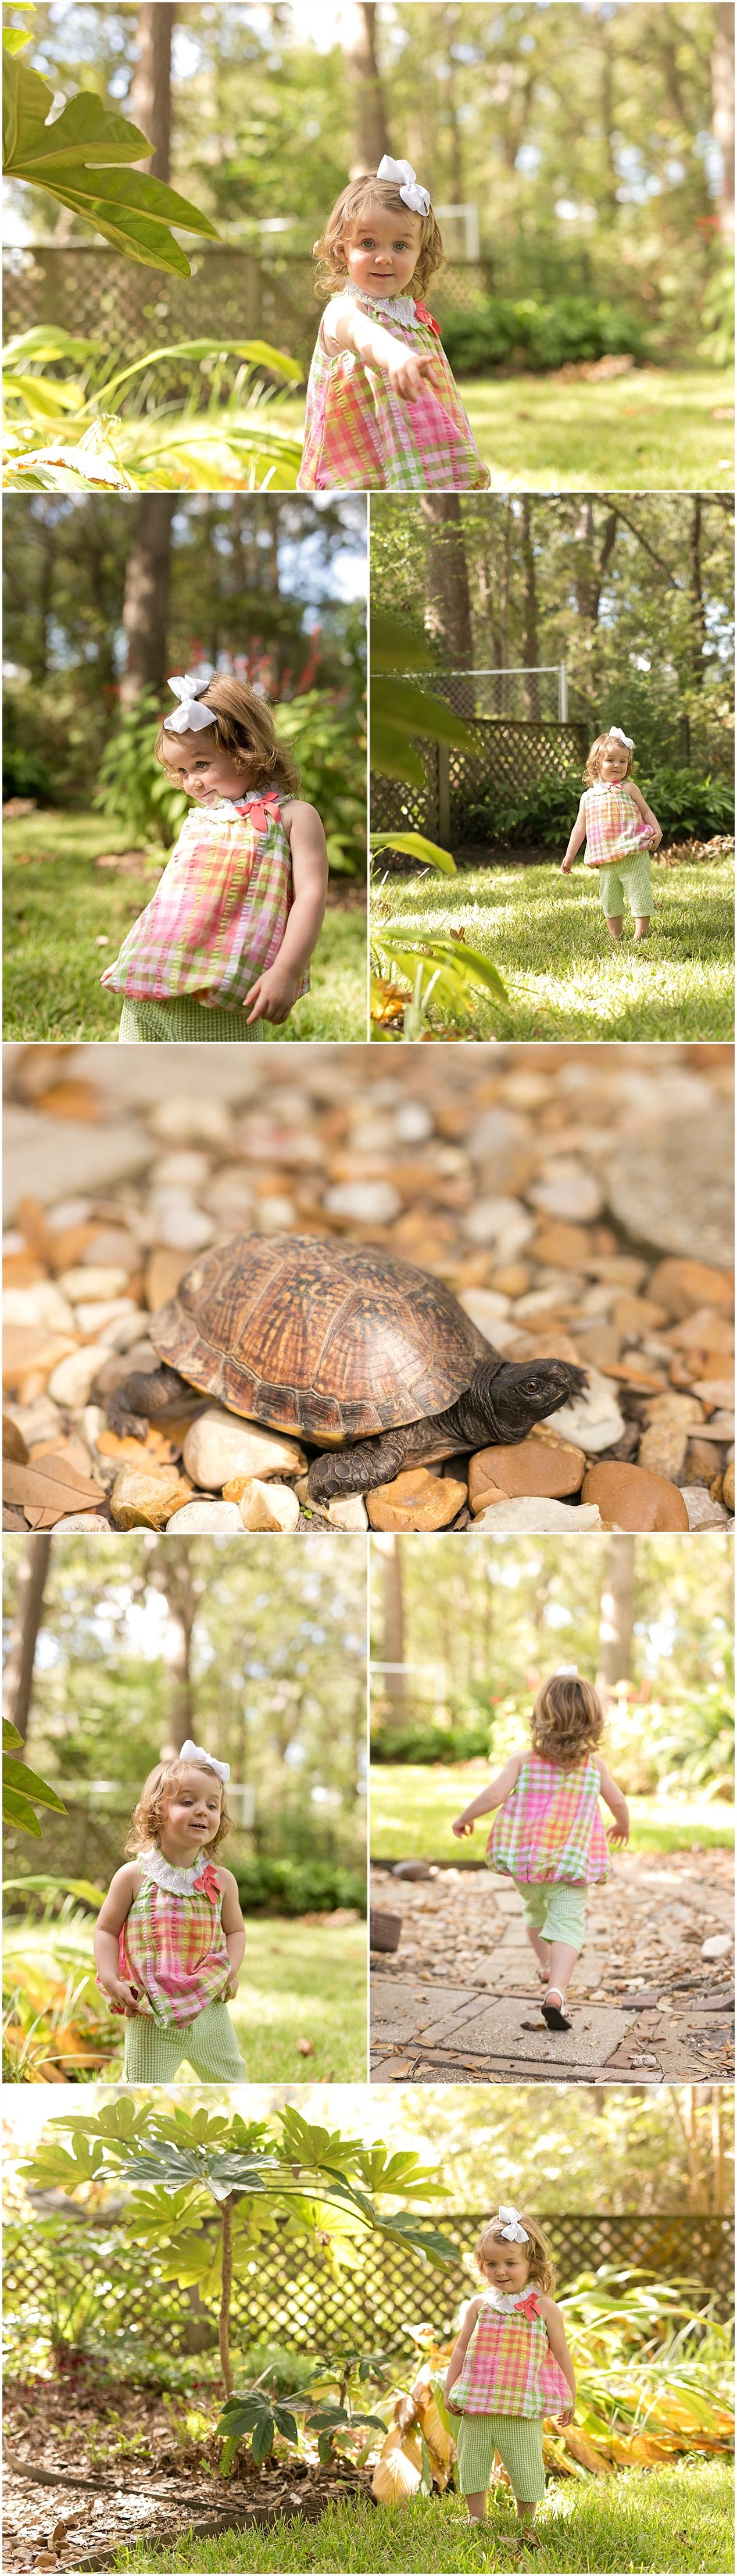 little girl with turtle in backyard